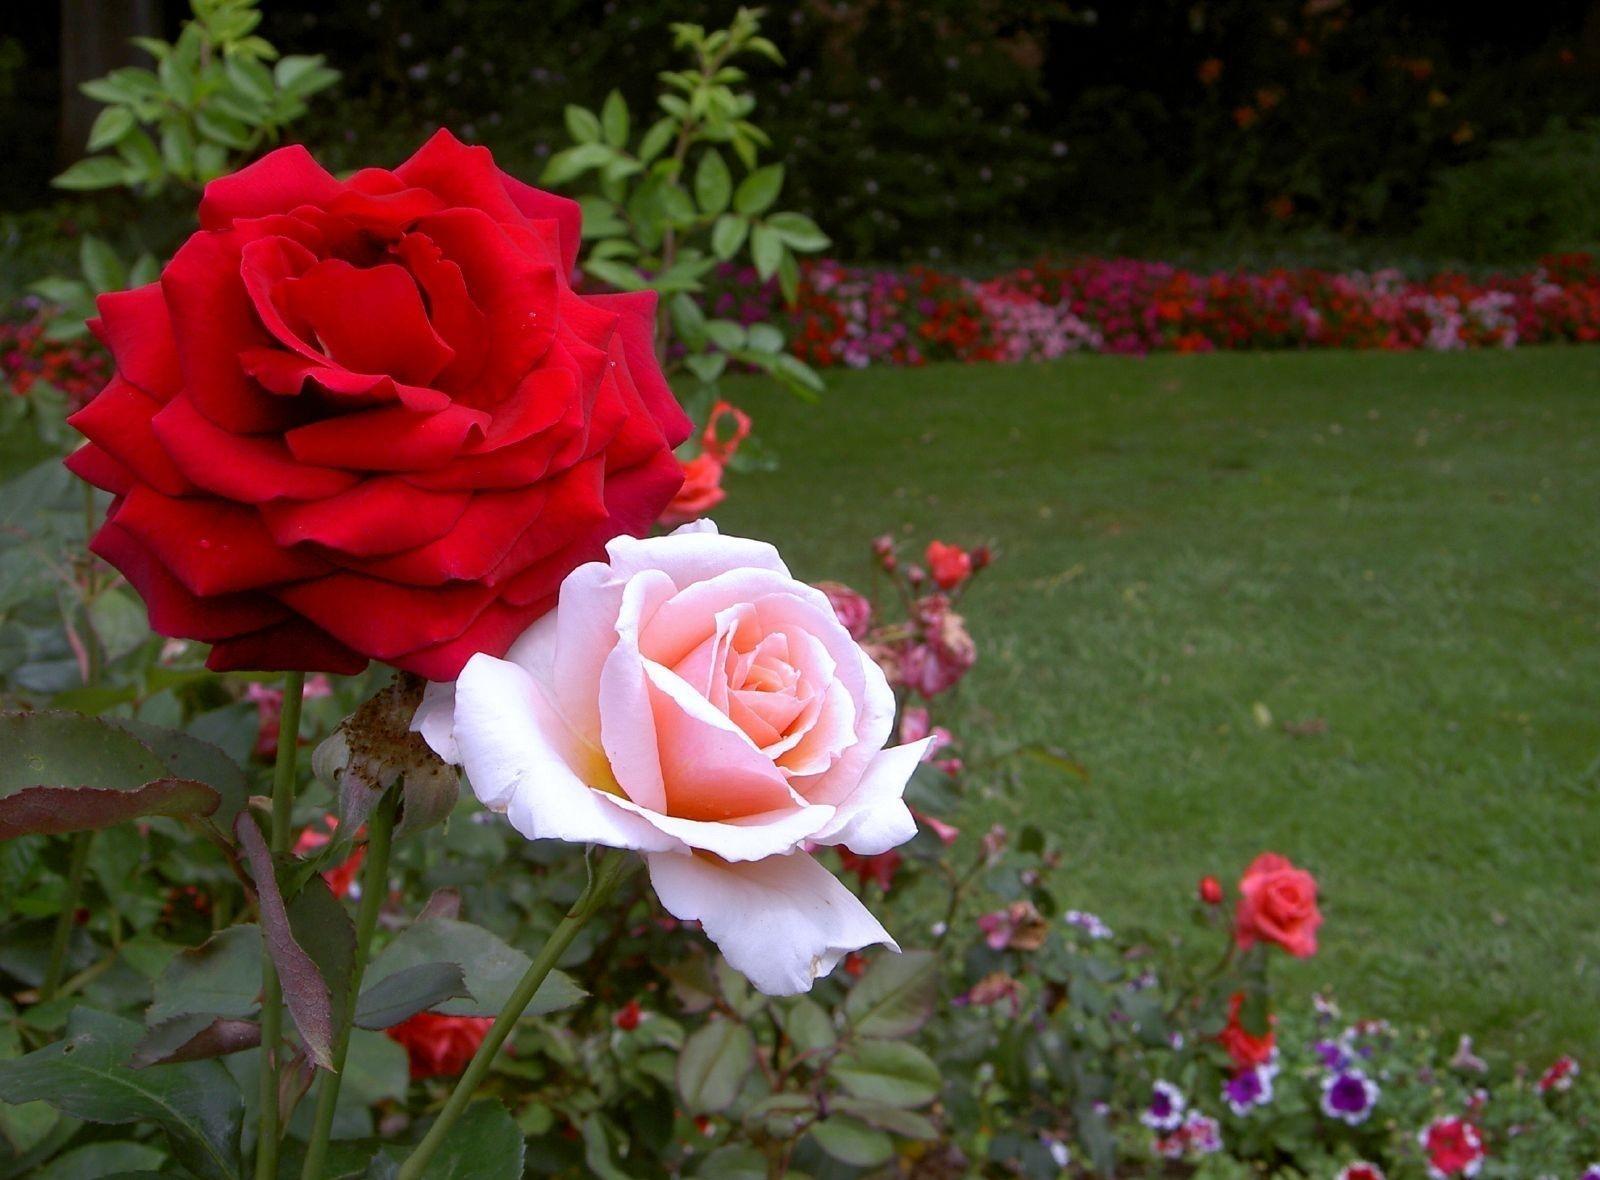 Rose Flower Garden - Flower HD Wallpapers, Images ...